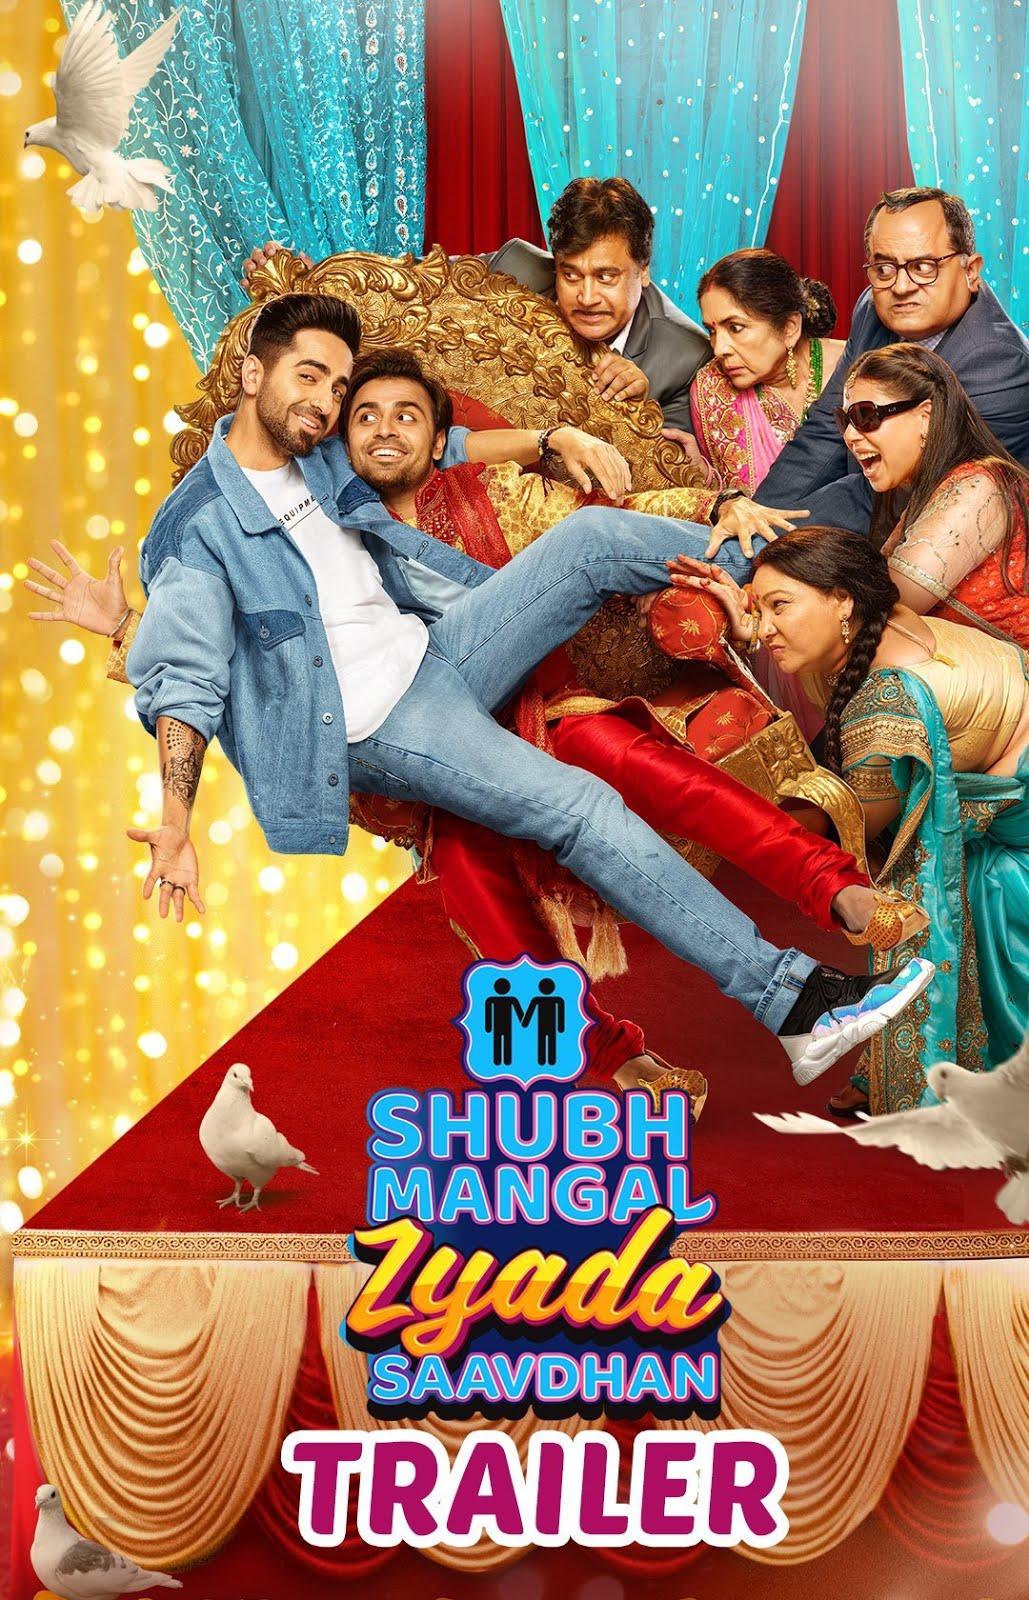 Shubh Mangal Zyada Saavdhan 2020 Hindi Movie Pre-DVDRip 700MB